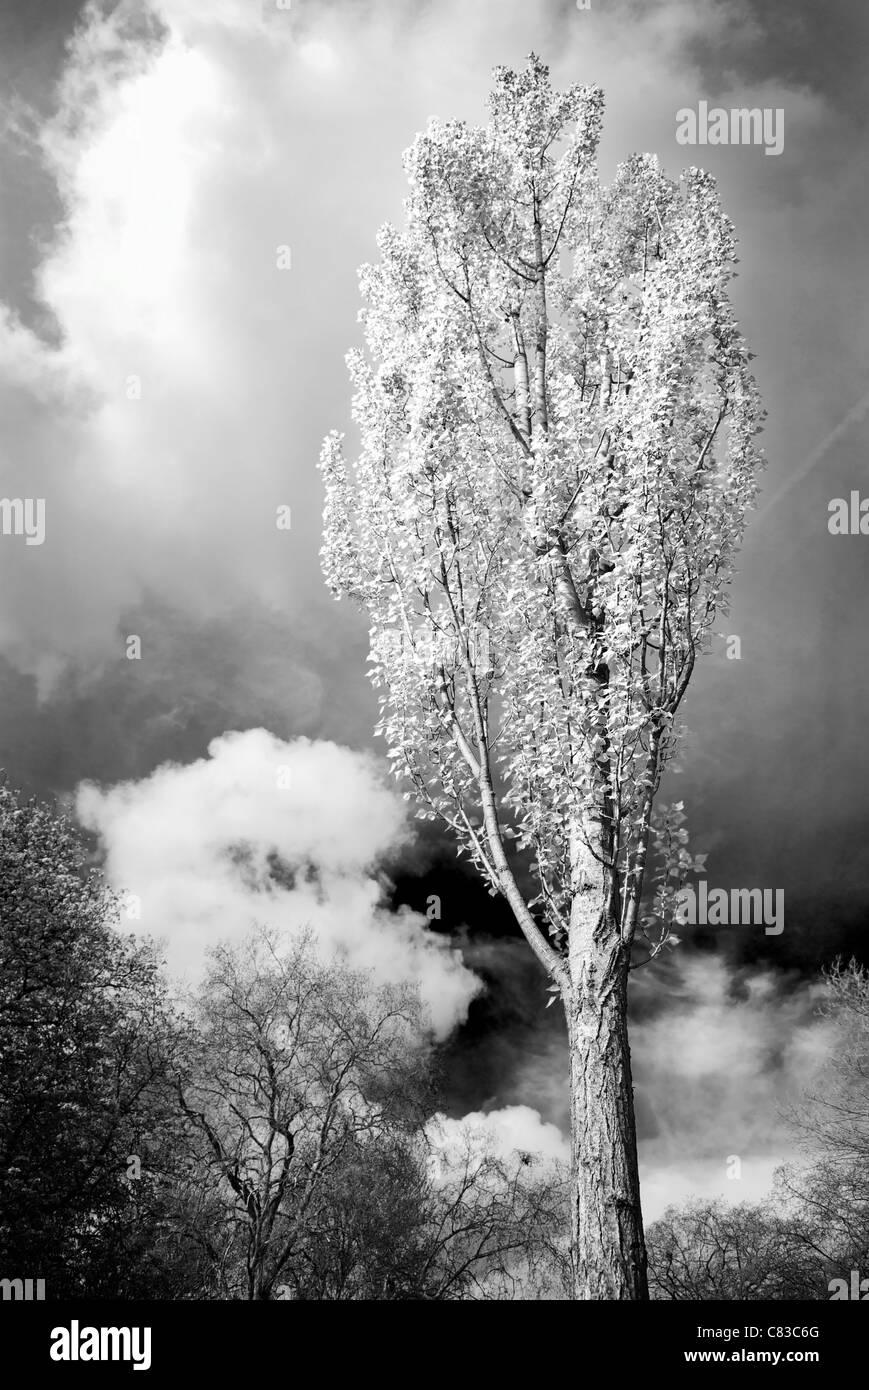 A poplar tree against a dramatic sky, London, UK. - Stock Image